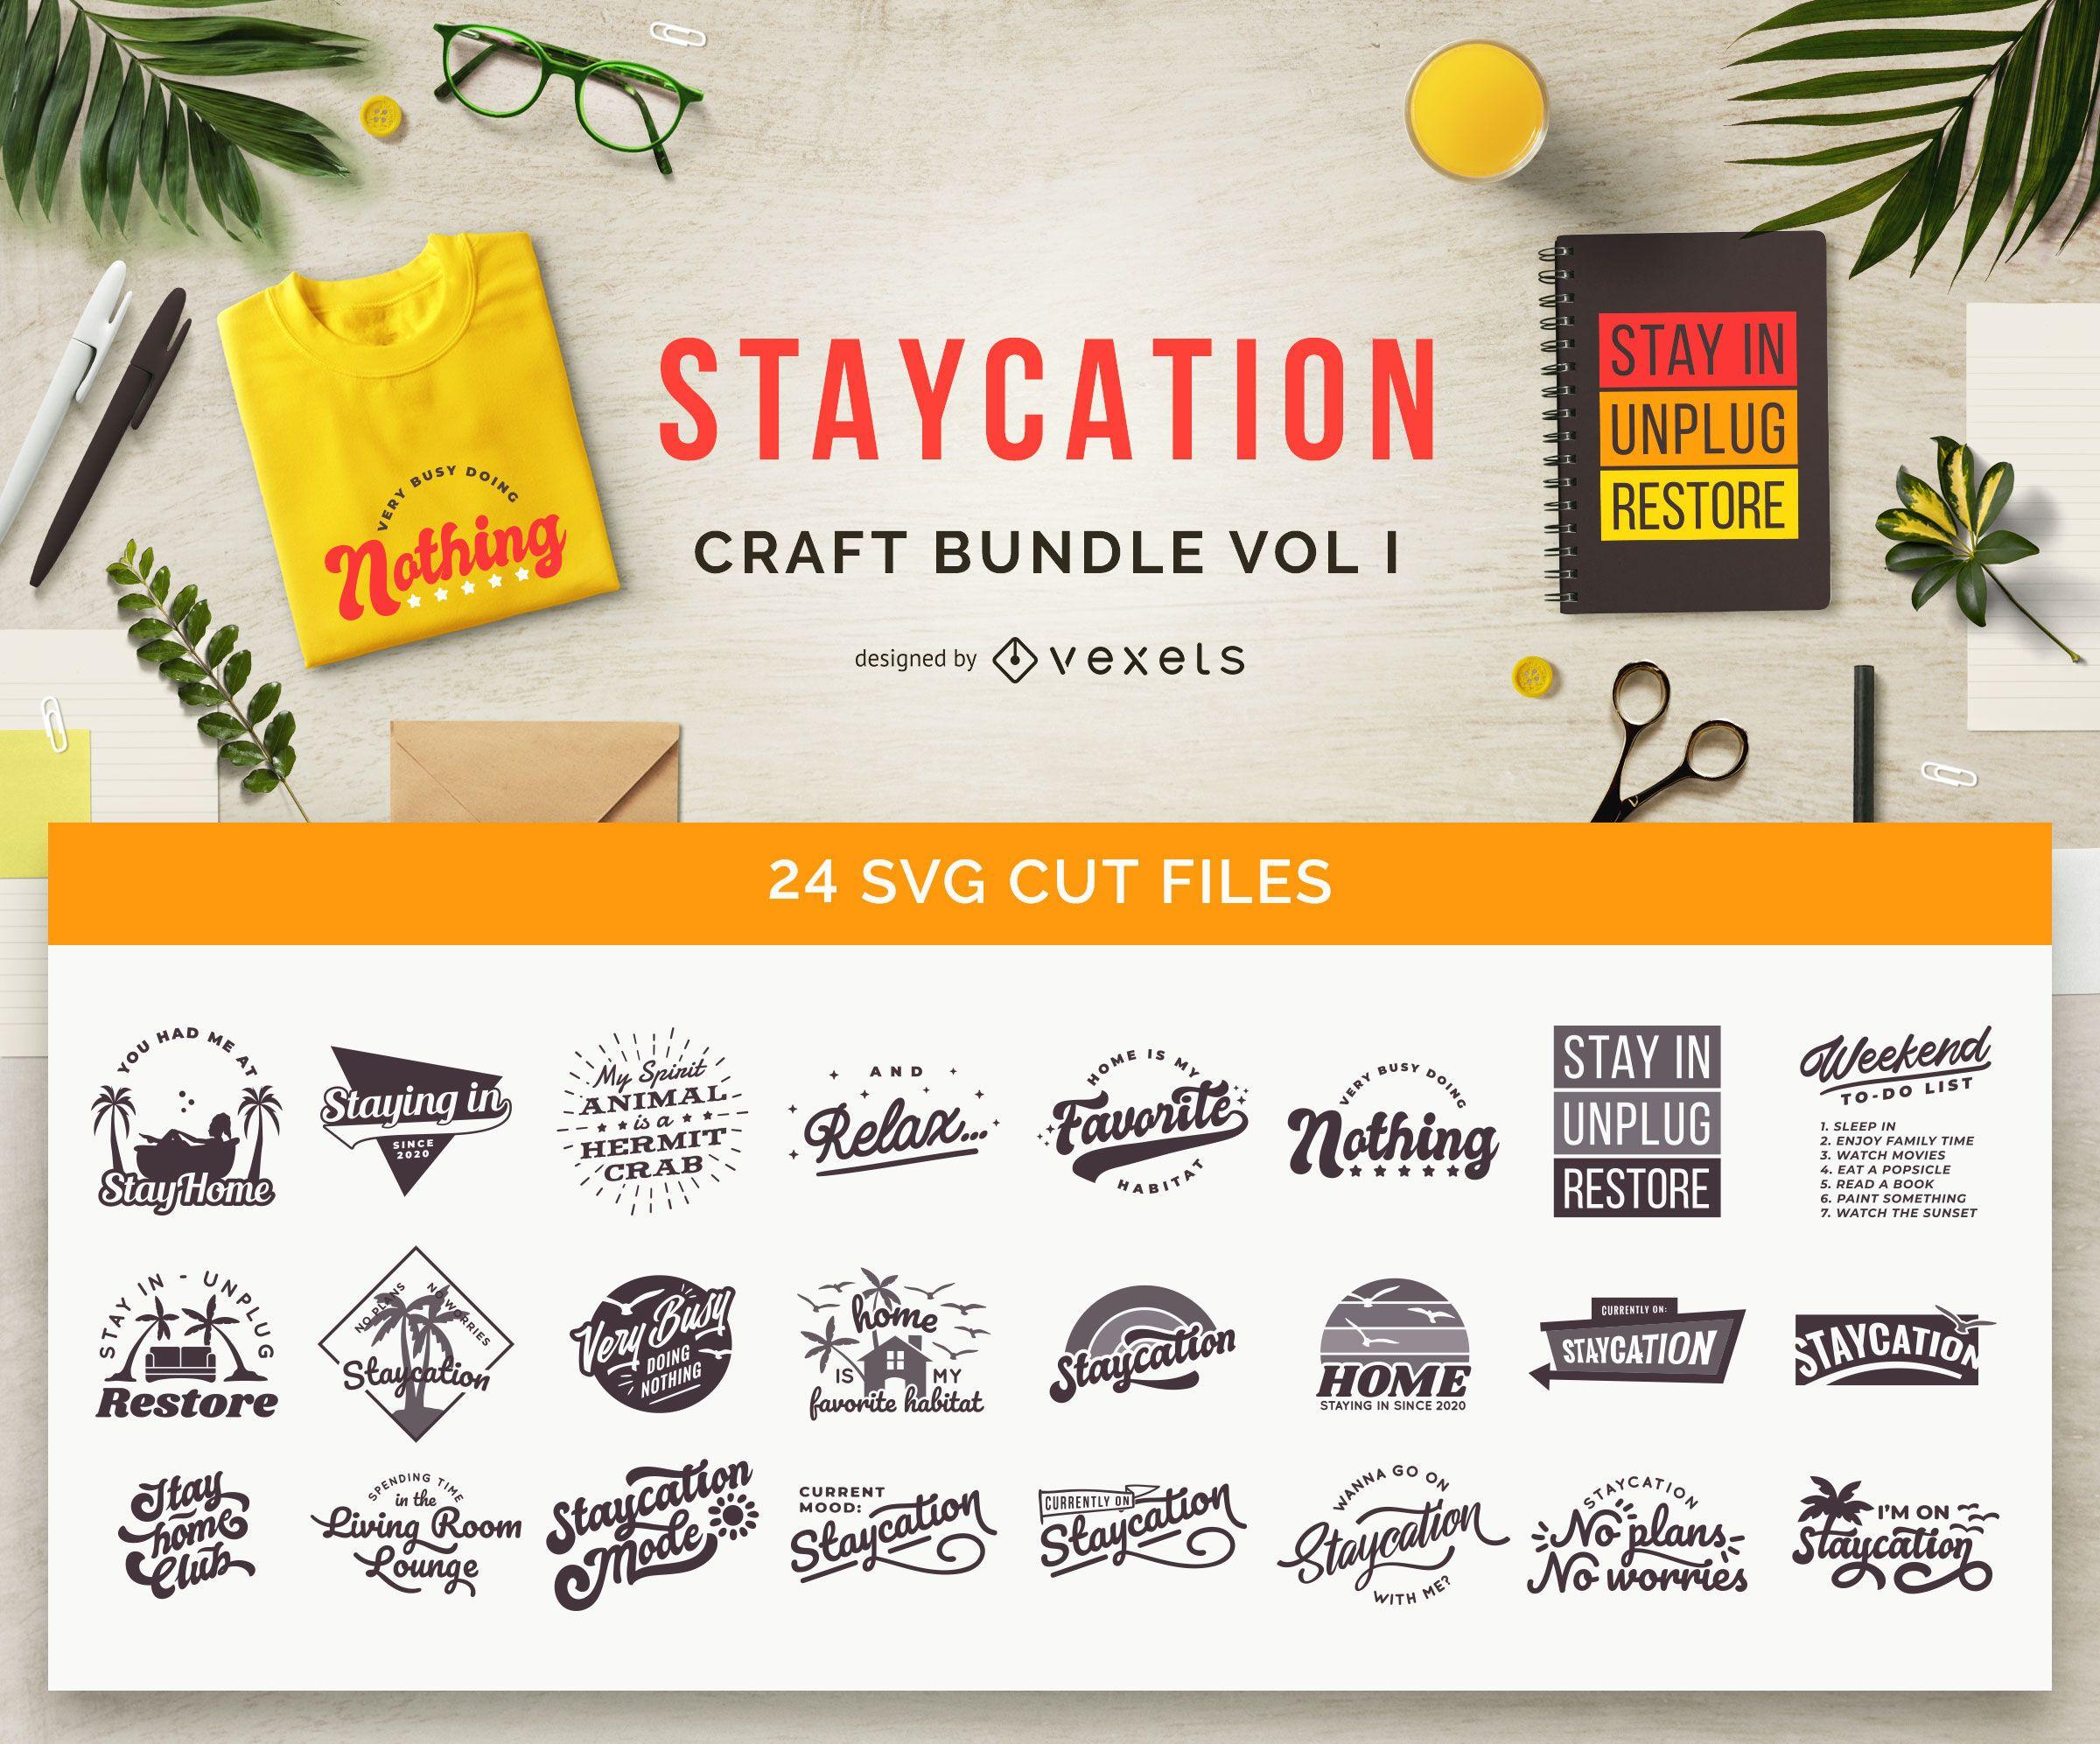 Staycation Craft Bundle Vol 1